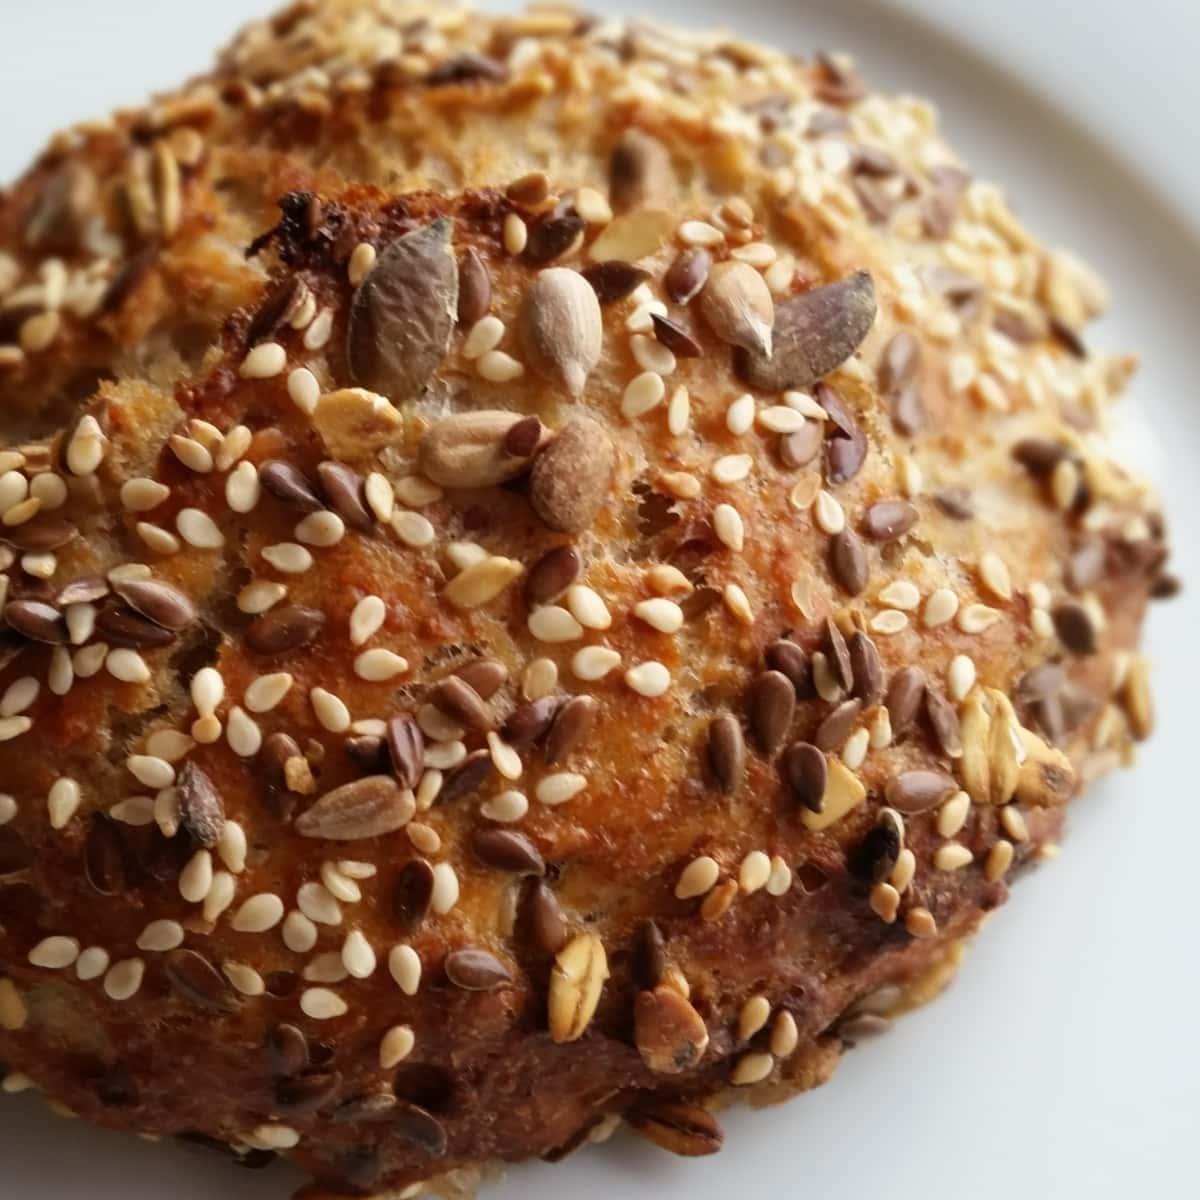 Sourdough buns/rolls -surdejsbolle - Danish Things © danishthings.com